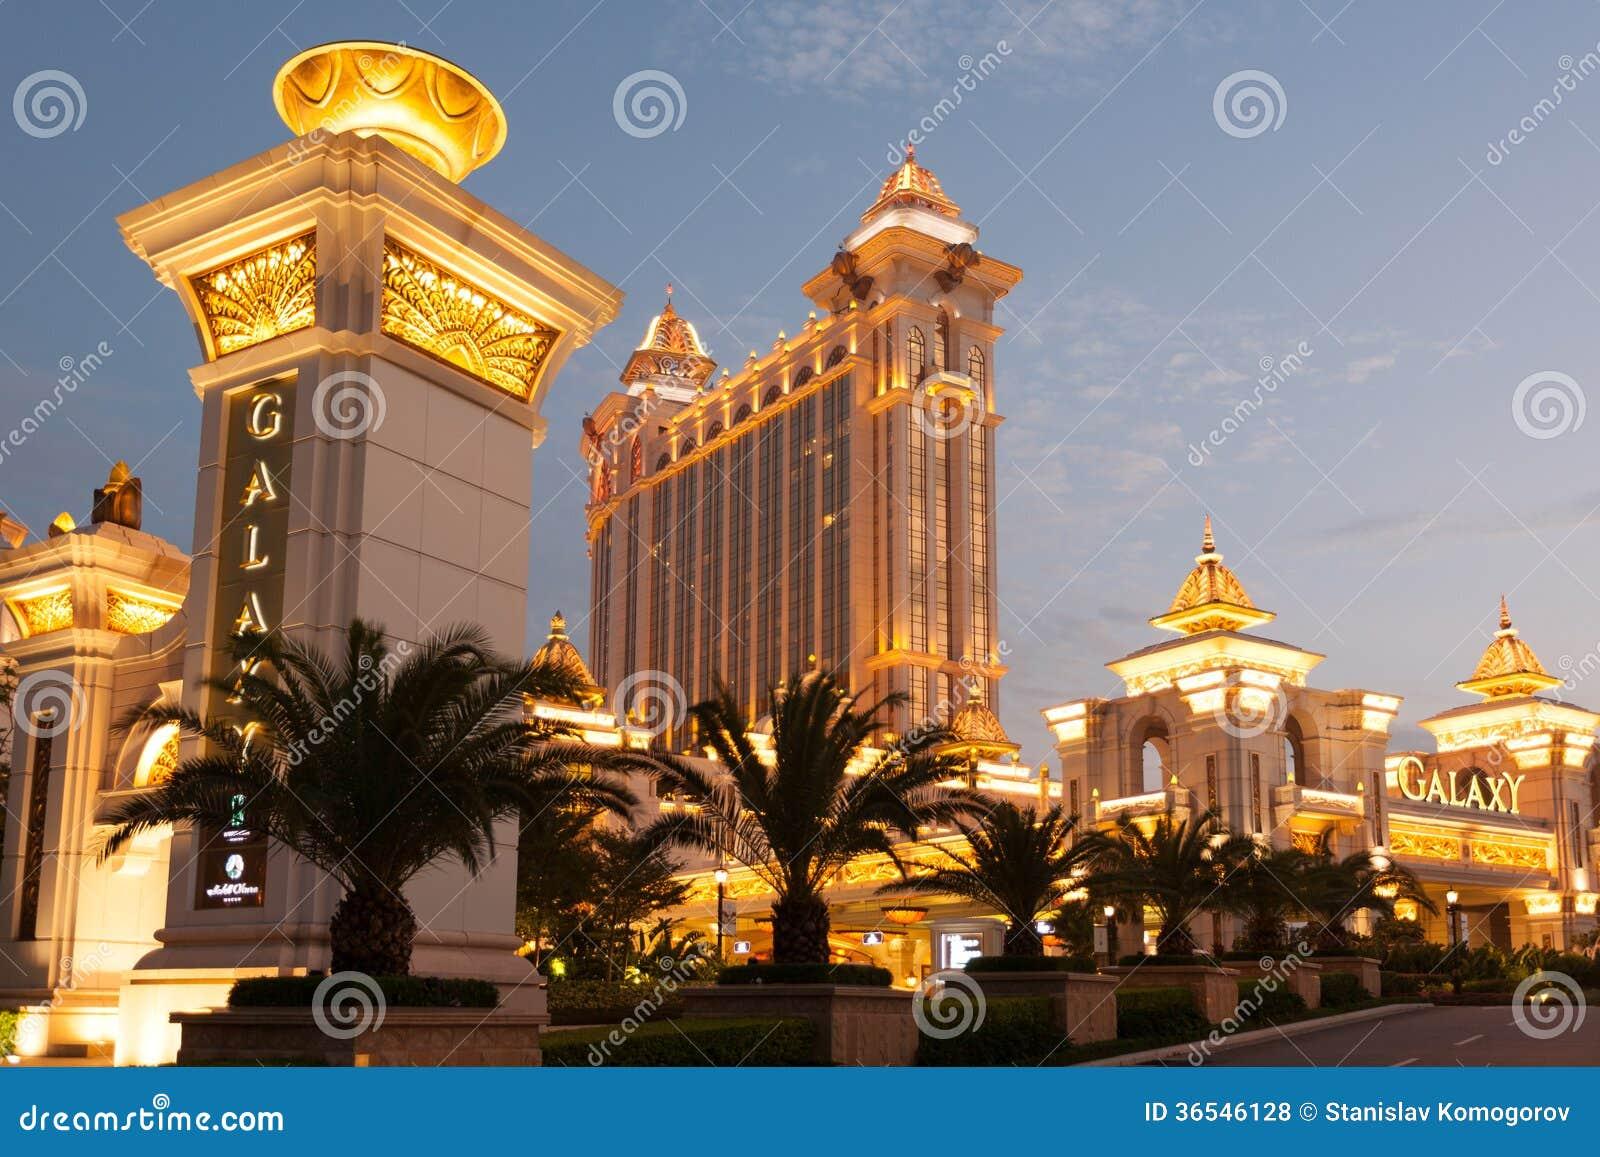 Galaxy Casino